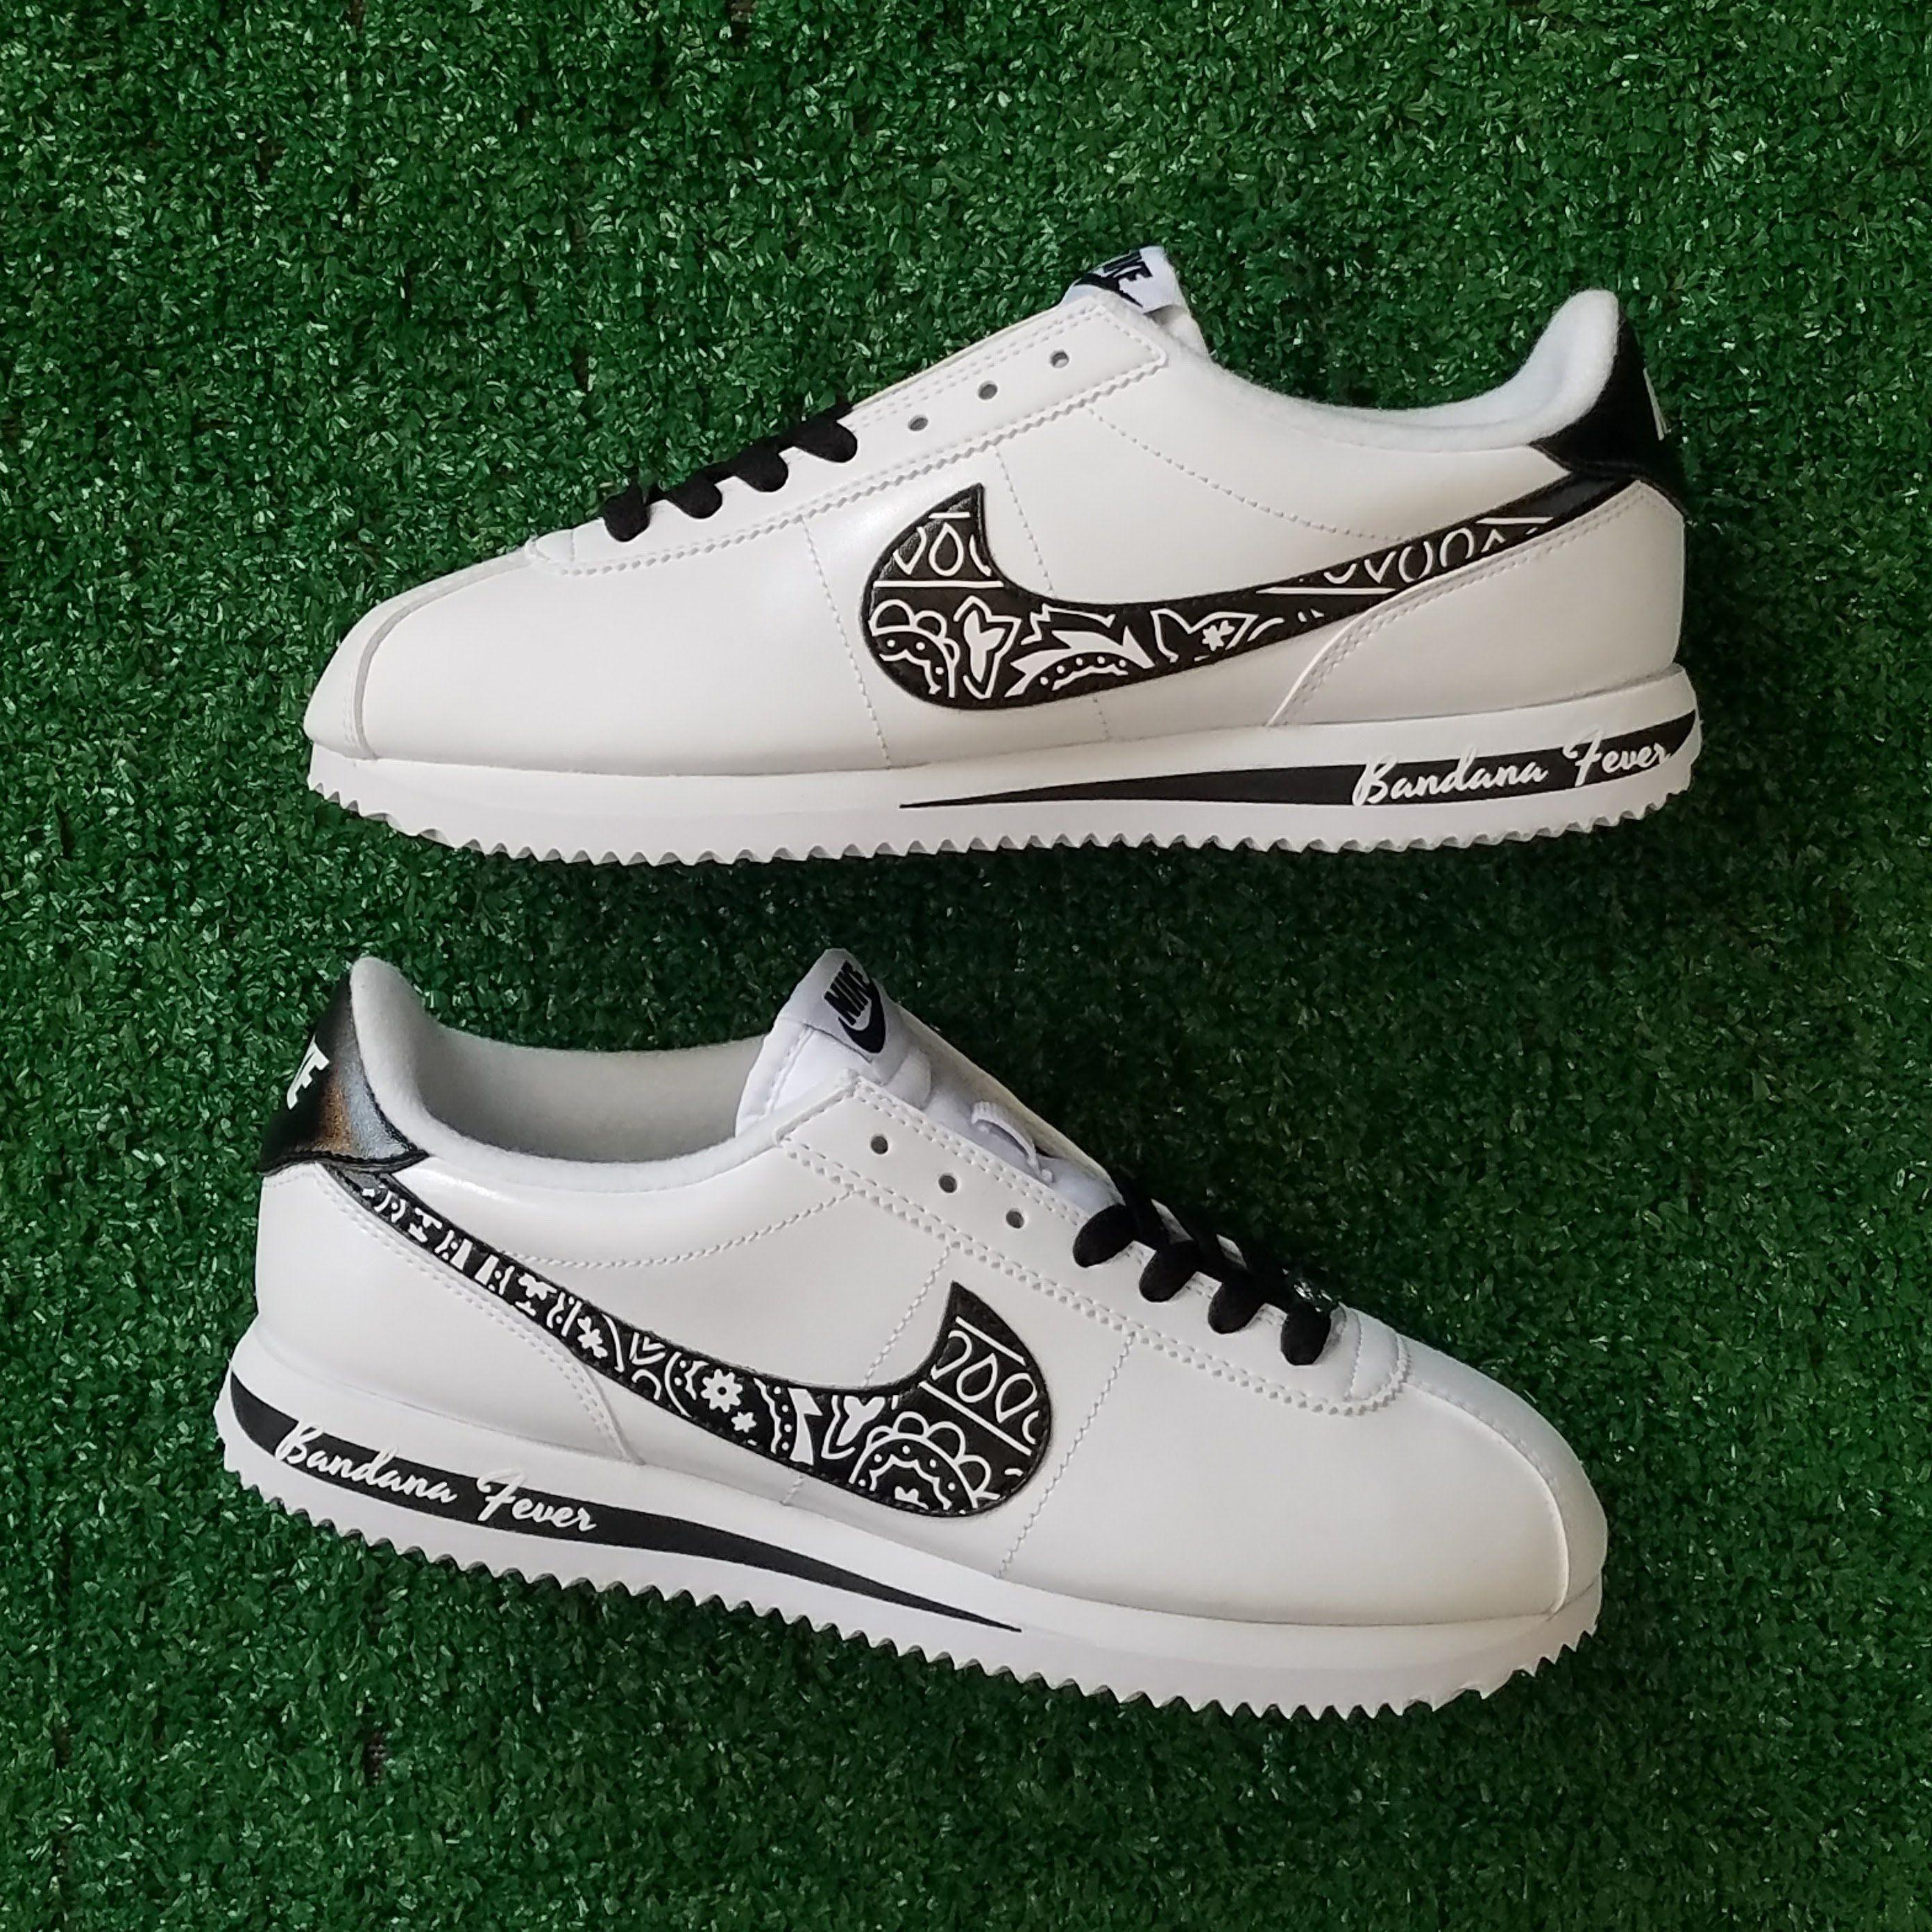 Customized Nike Sneakers, Men's, White